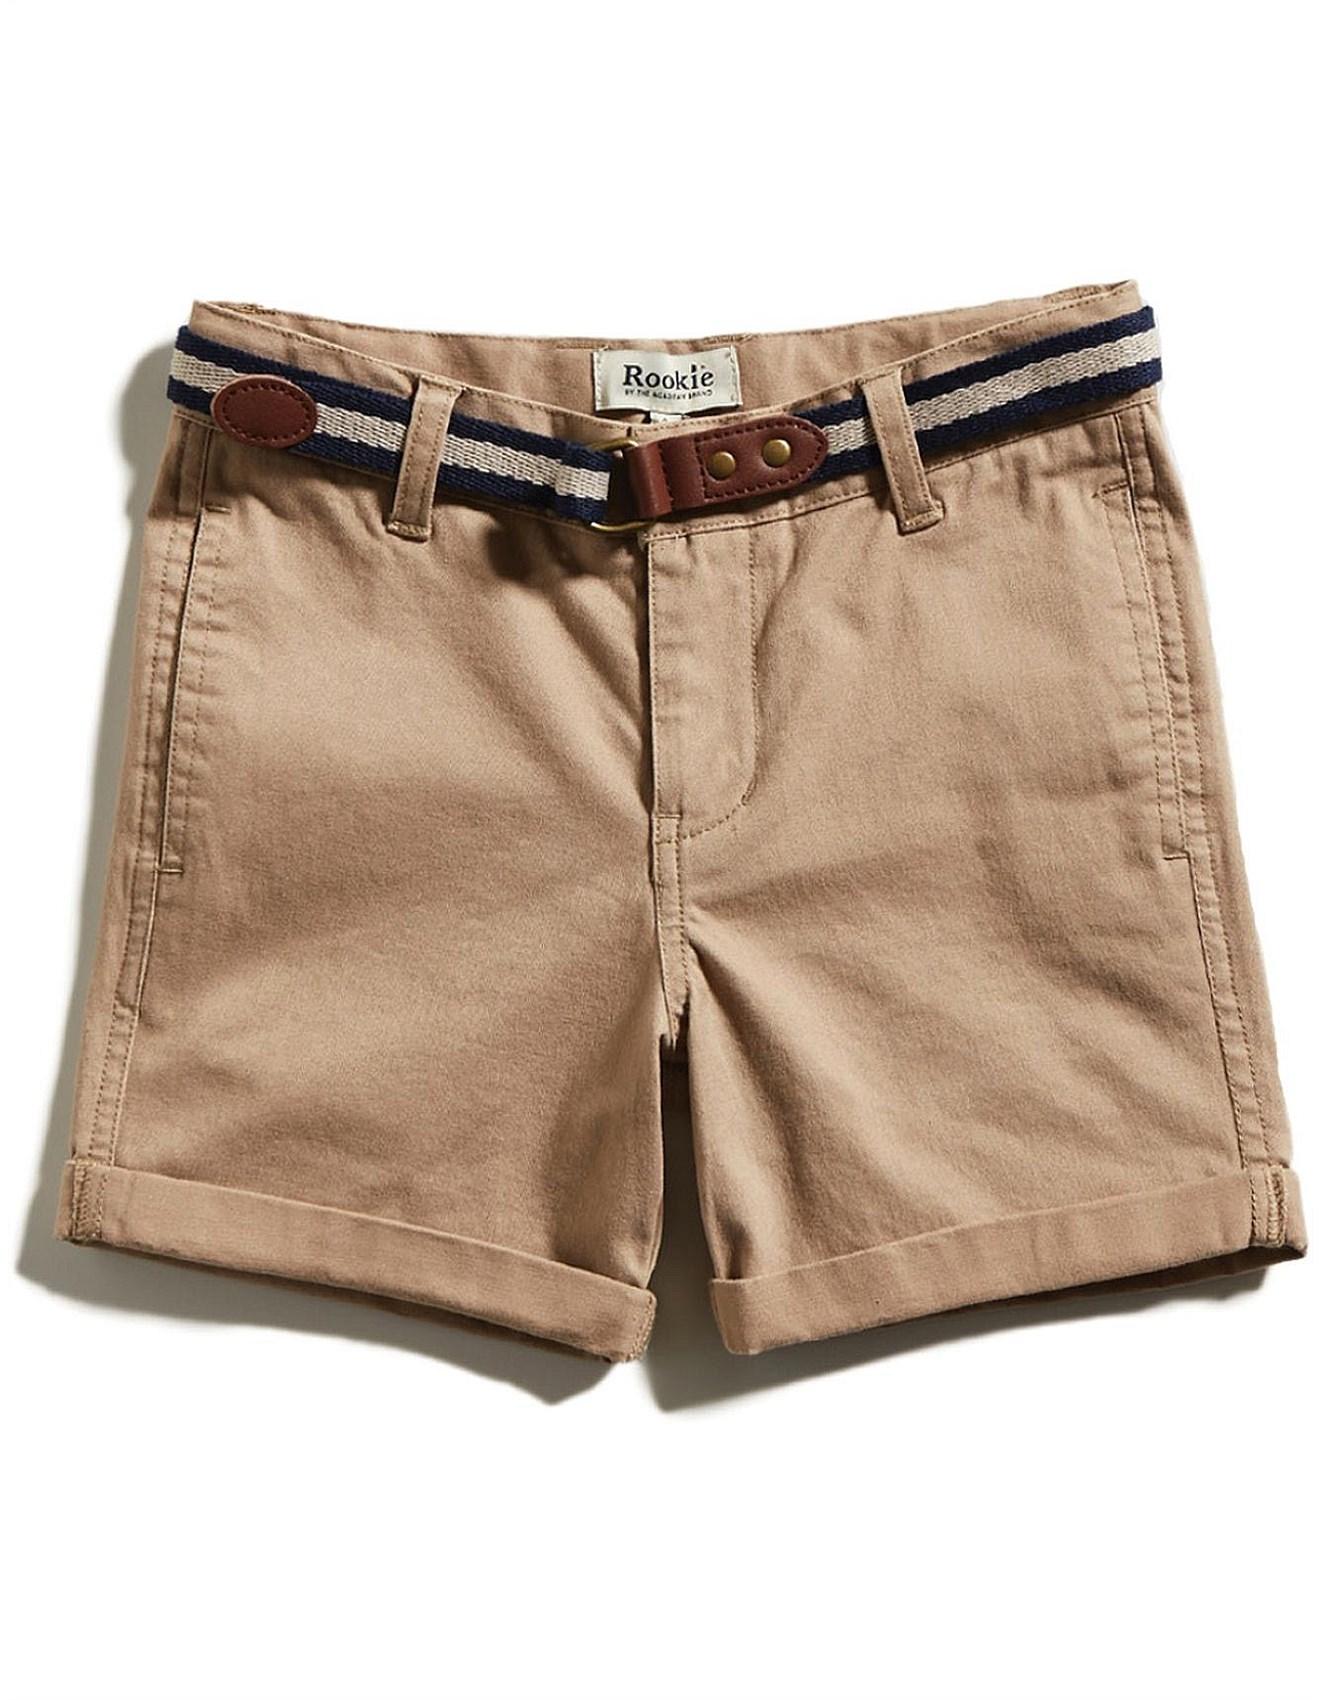 75e48a9b7 Hayman Short (Boys 2-7 Years)